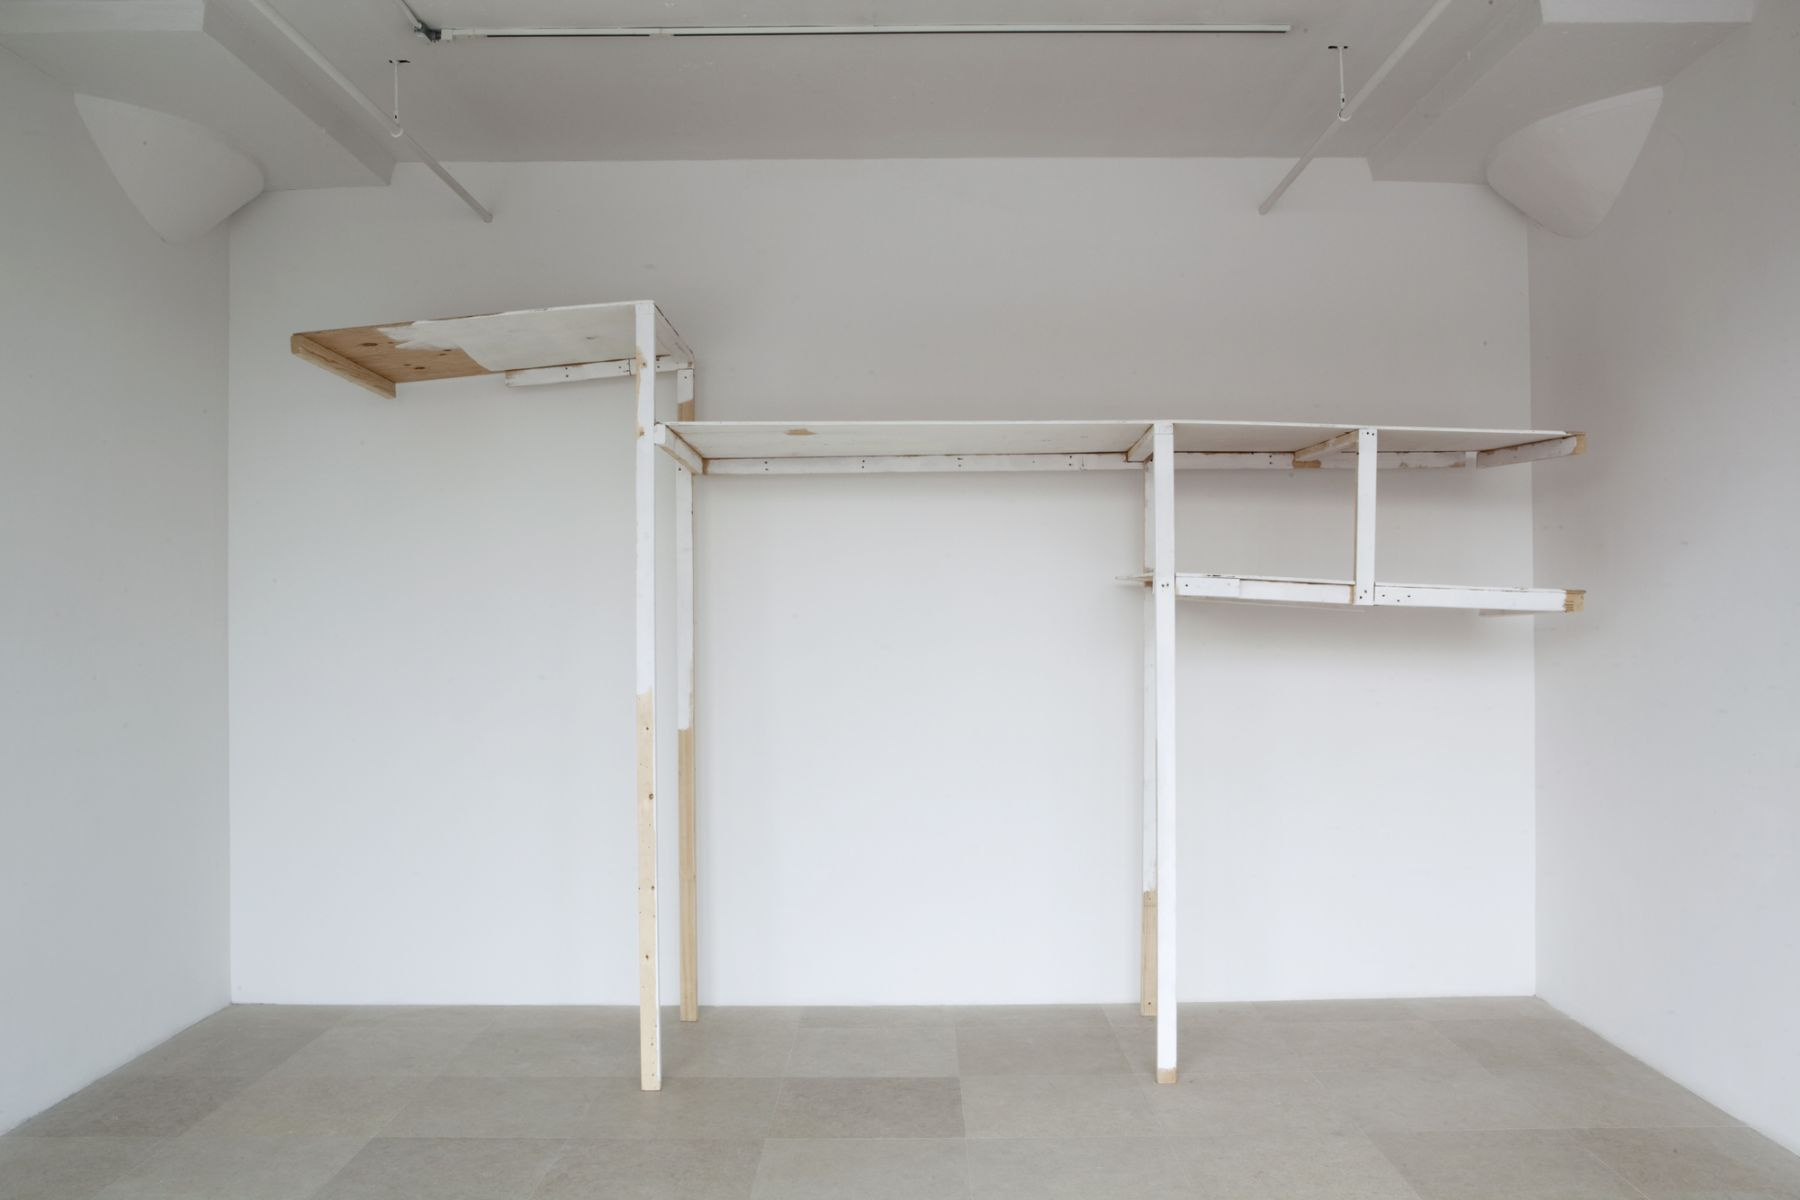 Gedi Sibony Set Into Motion , 2010 Wood, screws, paint 106 x 176 x 36 1/2 inches 269.2 x 447 x 92.7 cm